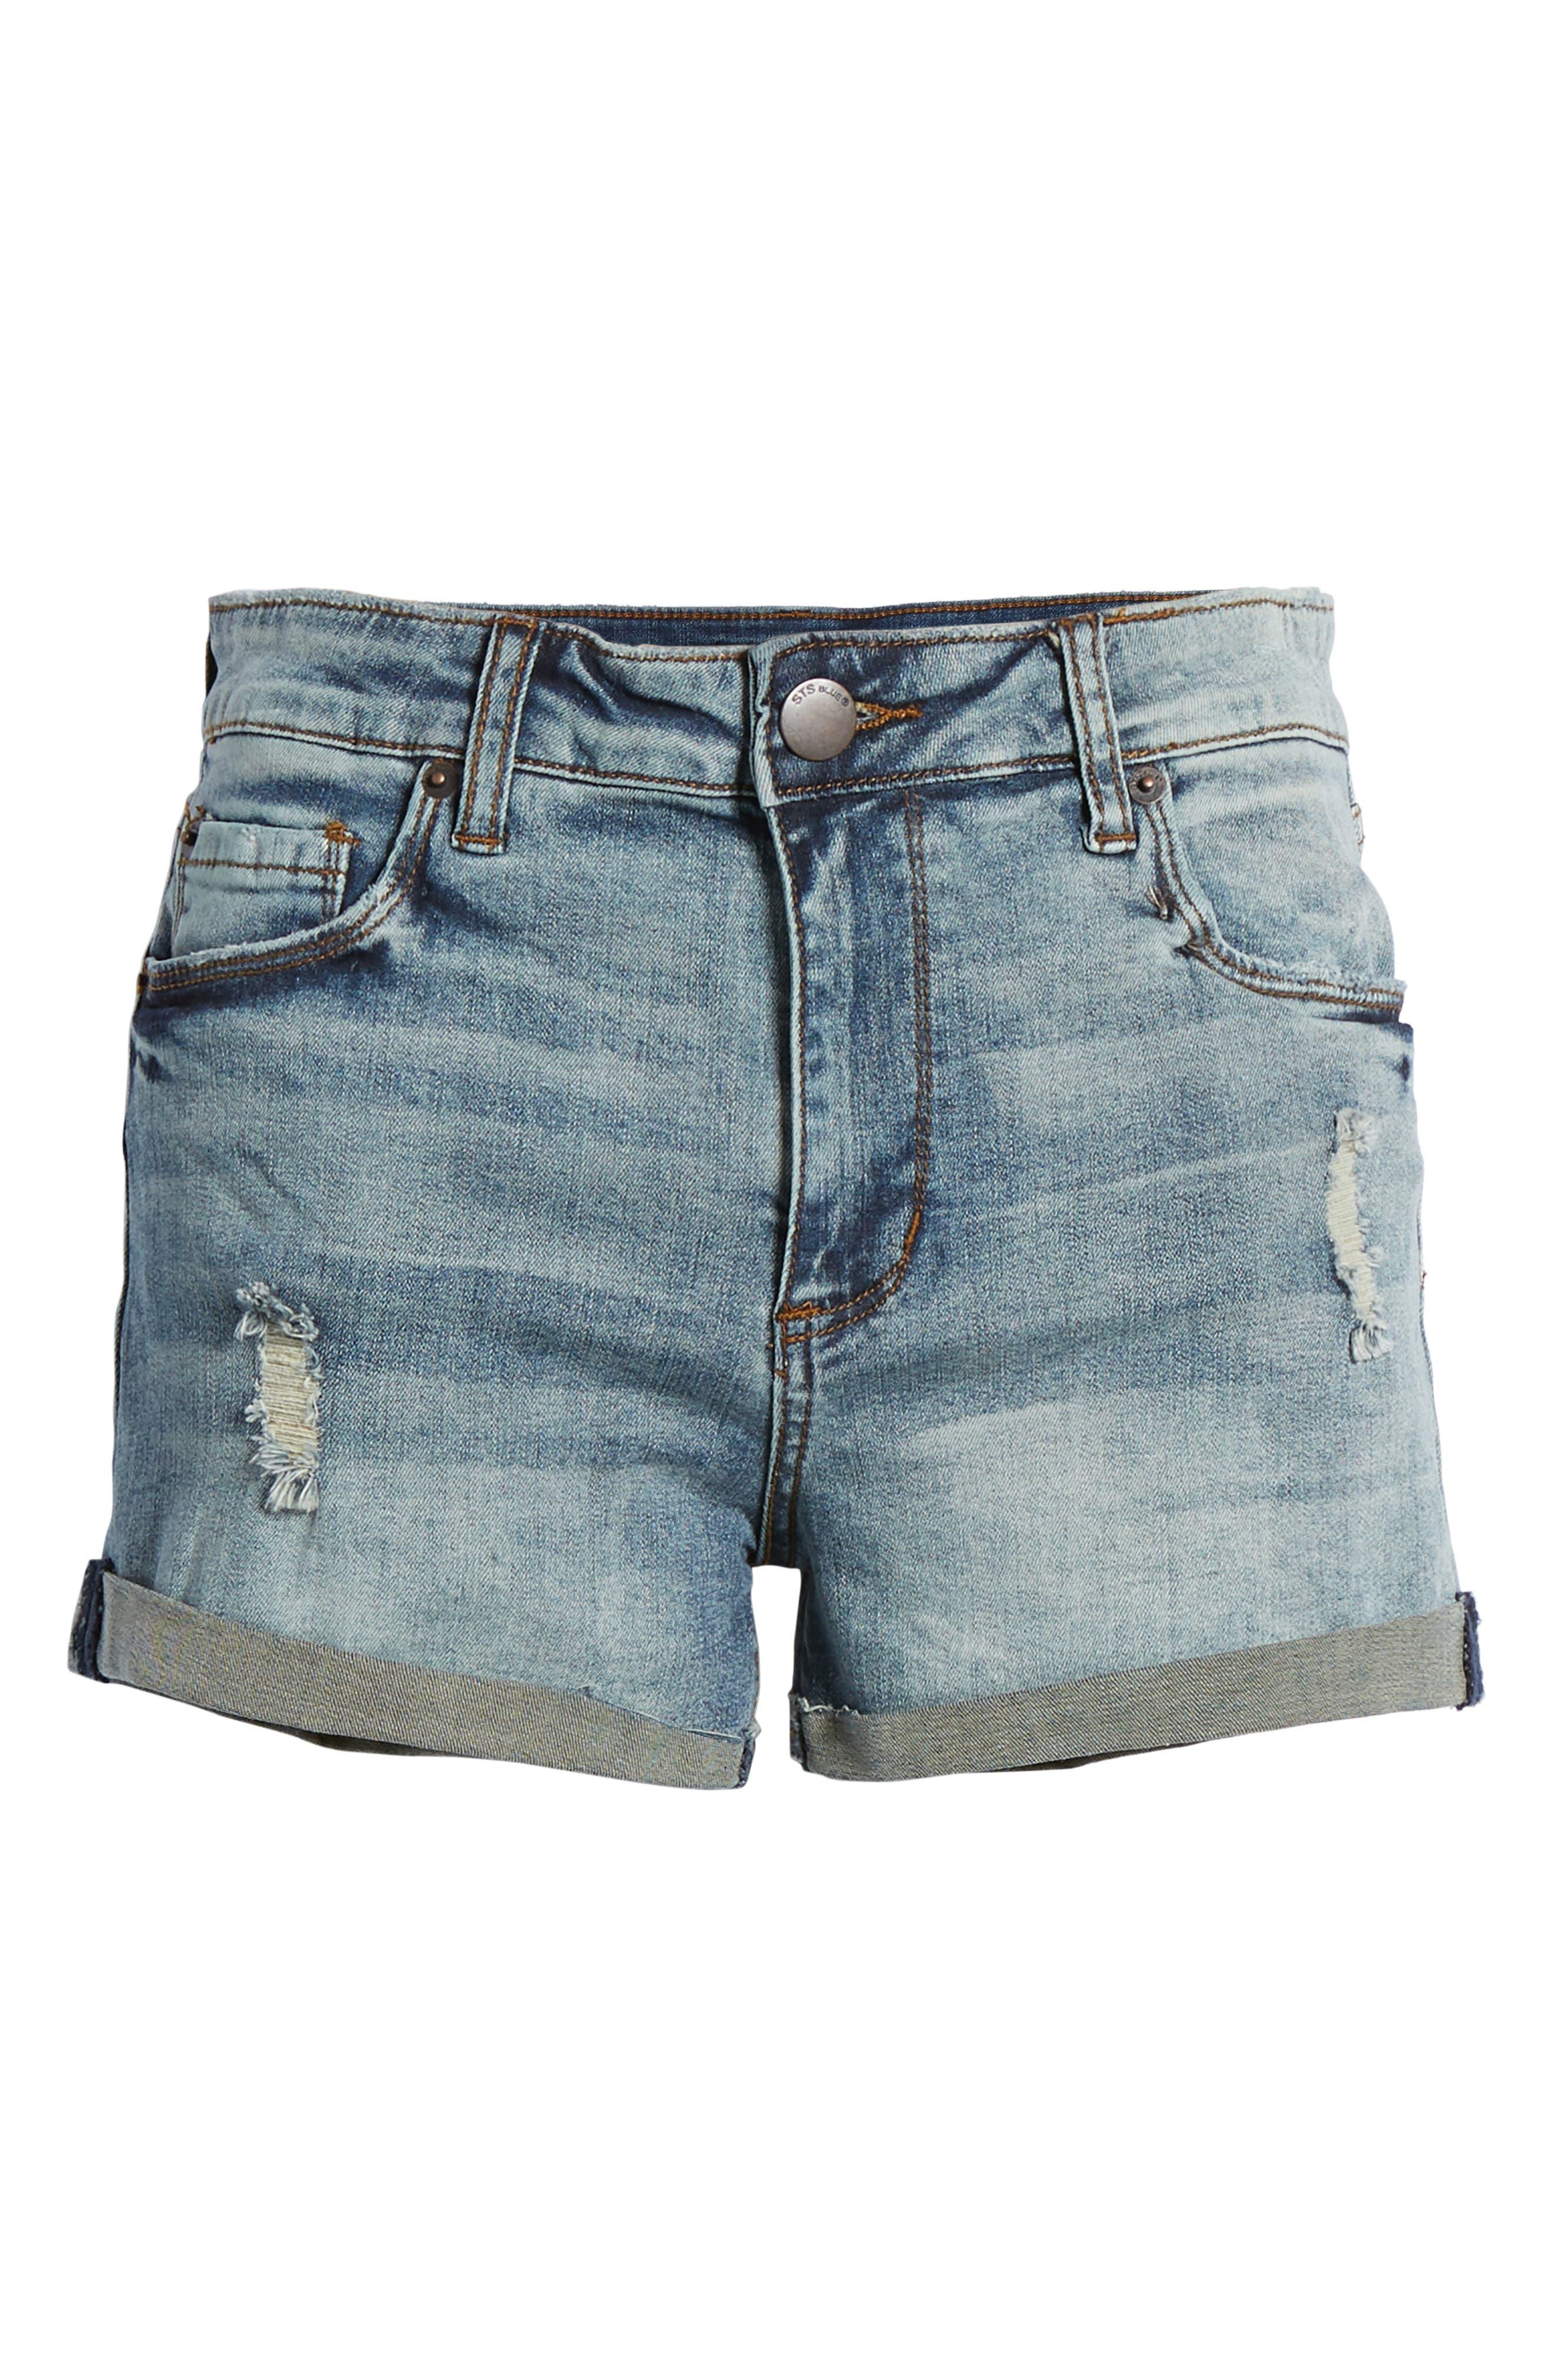 STS Blue Distressed High Waist Denim Shorts,                             Alternate thumbnail 7, color,                             402